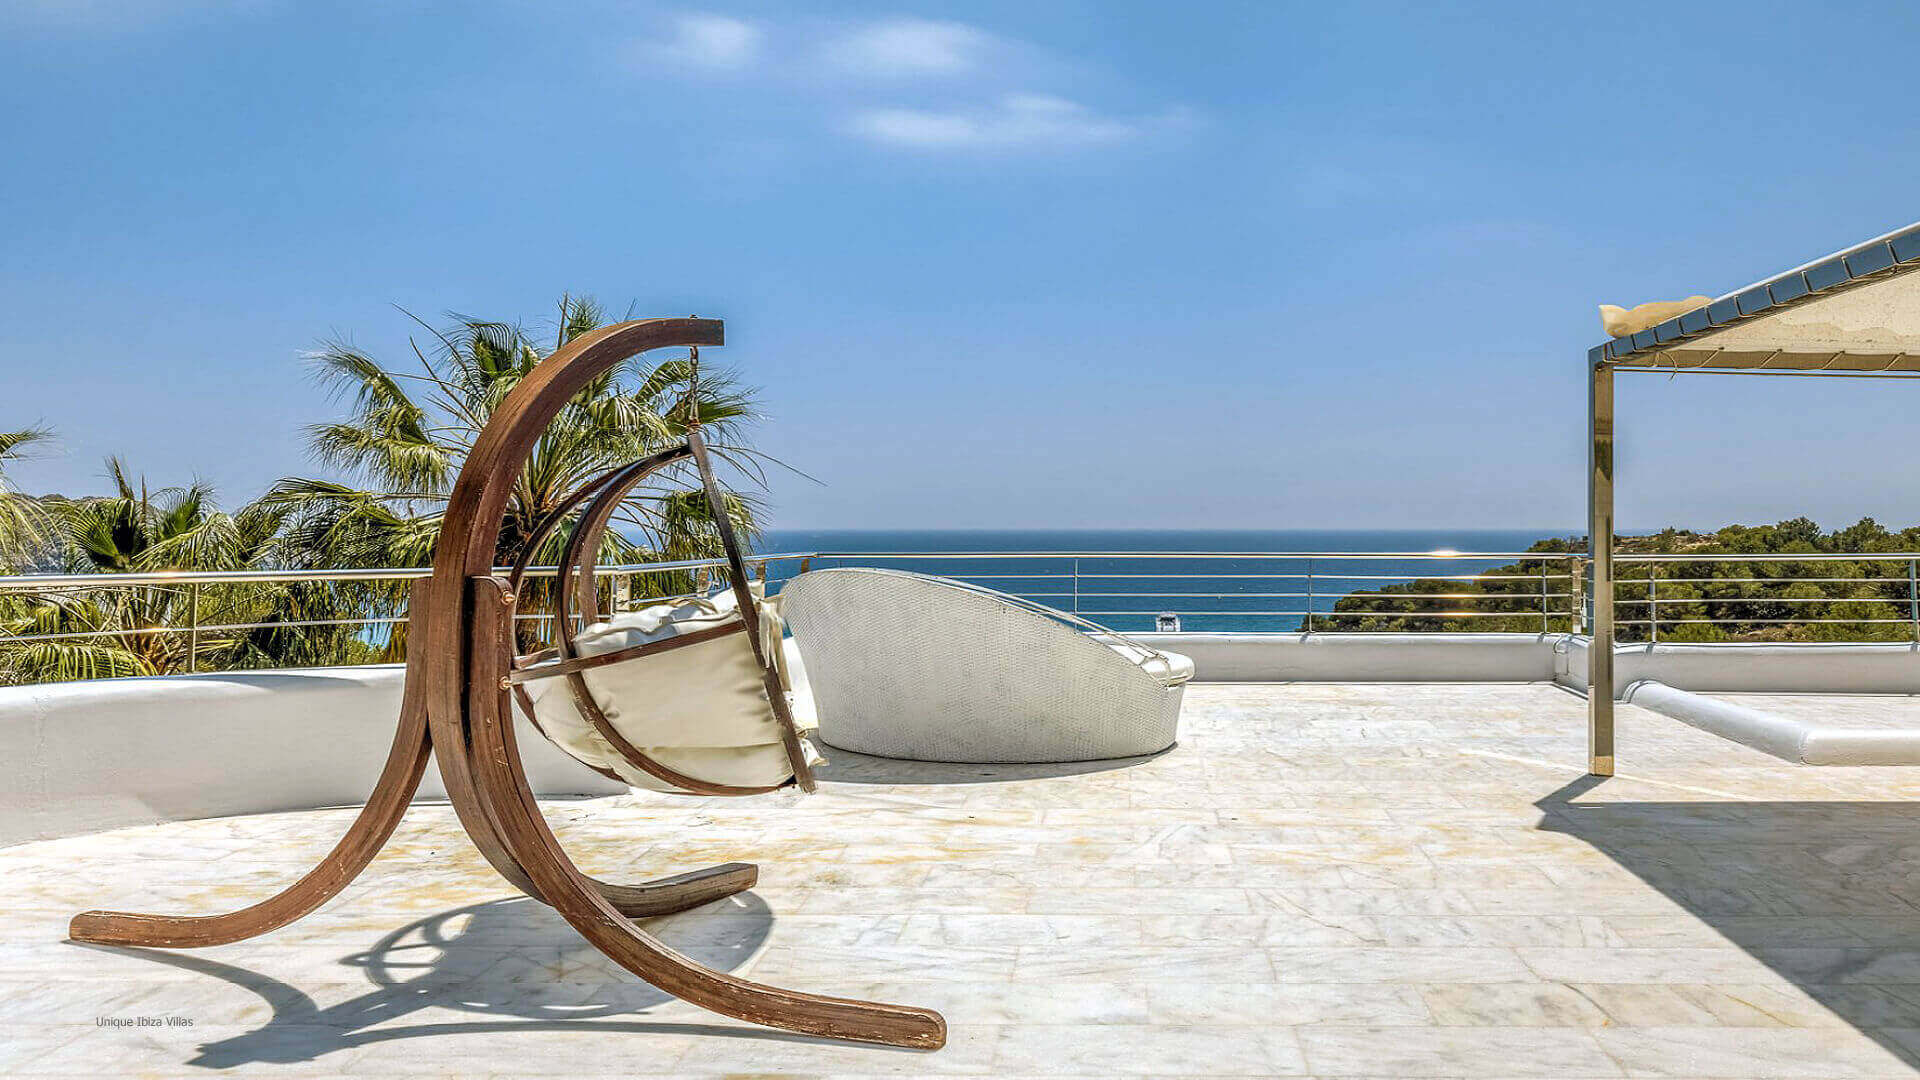 Villa Rica Ibiza 13 Cala Jondal